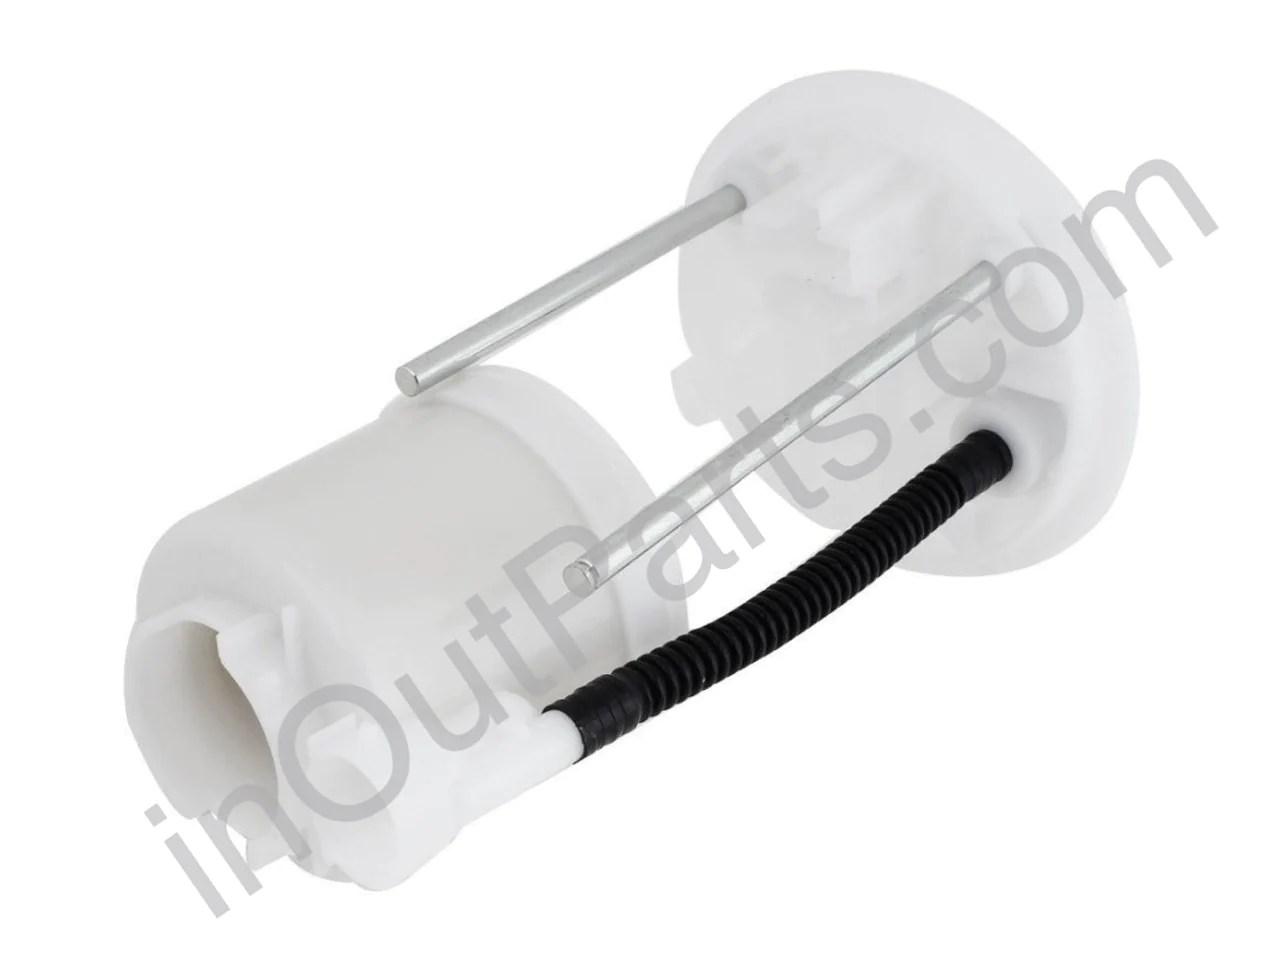 fuel filter toyota camry 2azfe 2006 2007 2008 2009 2010 2011 2012 2013 2014 2015 2016  [ 1280 x 960 Pixel ]